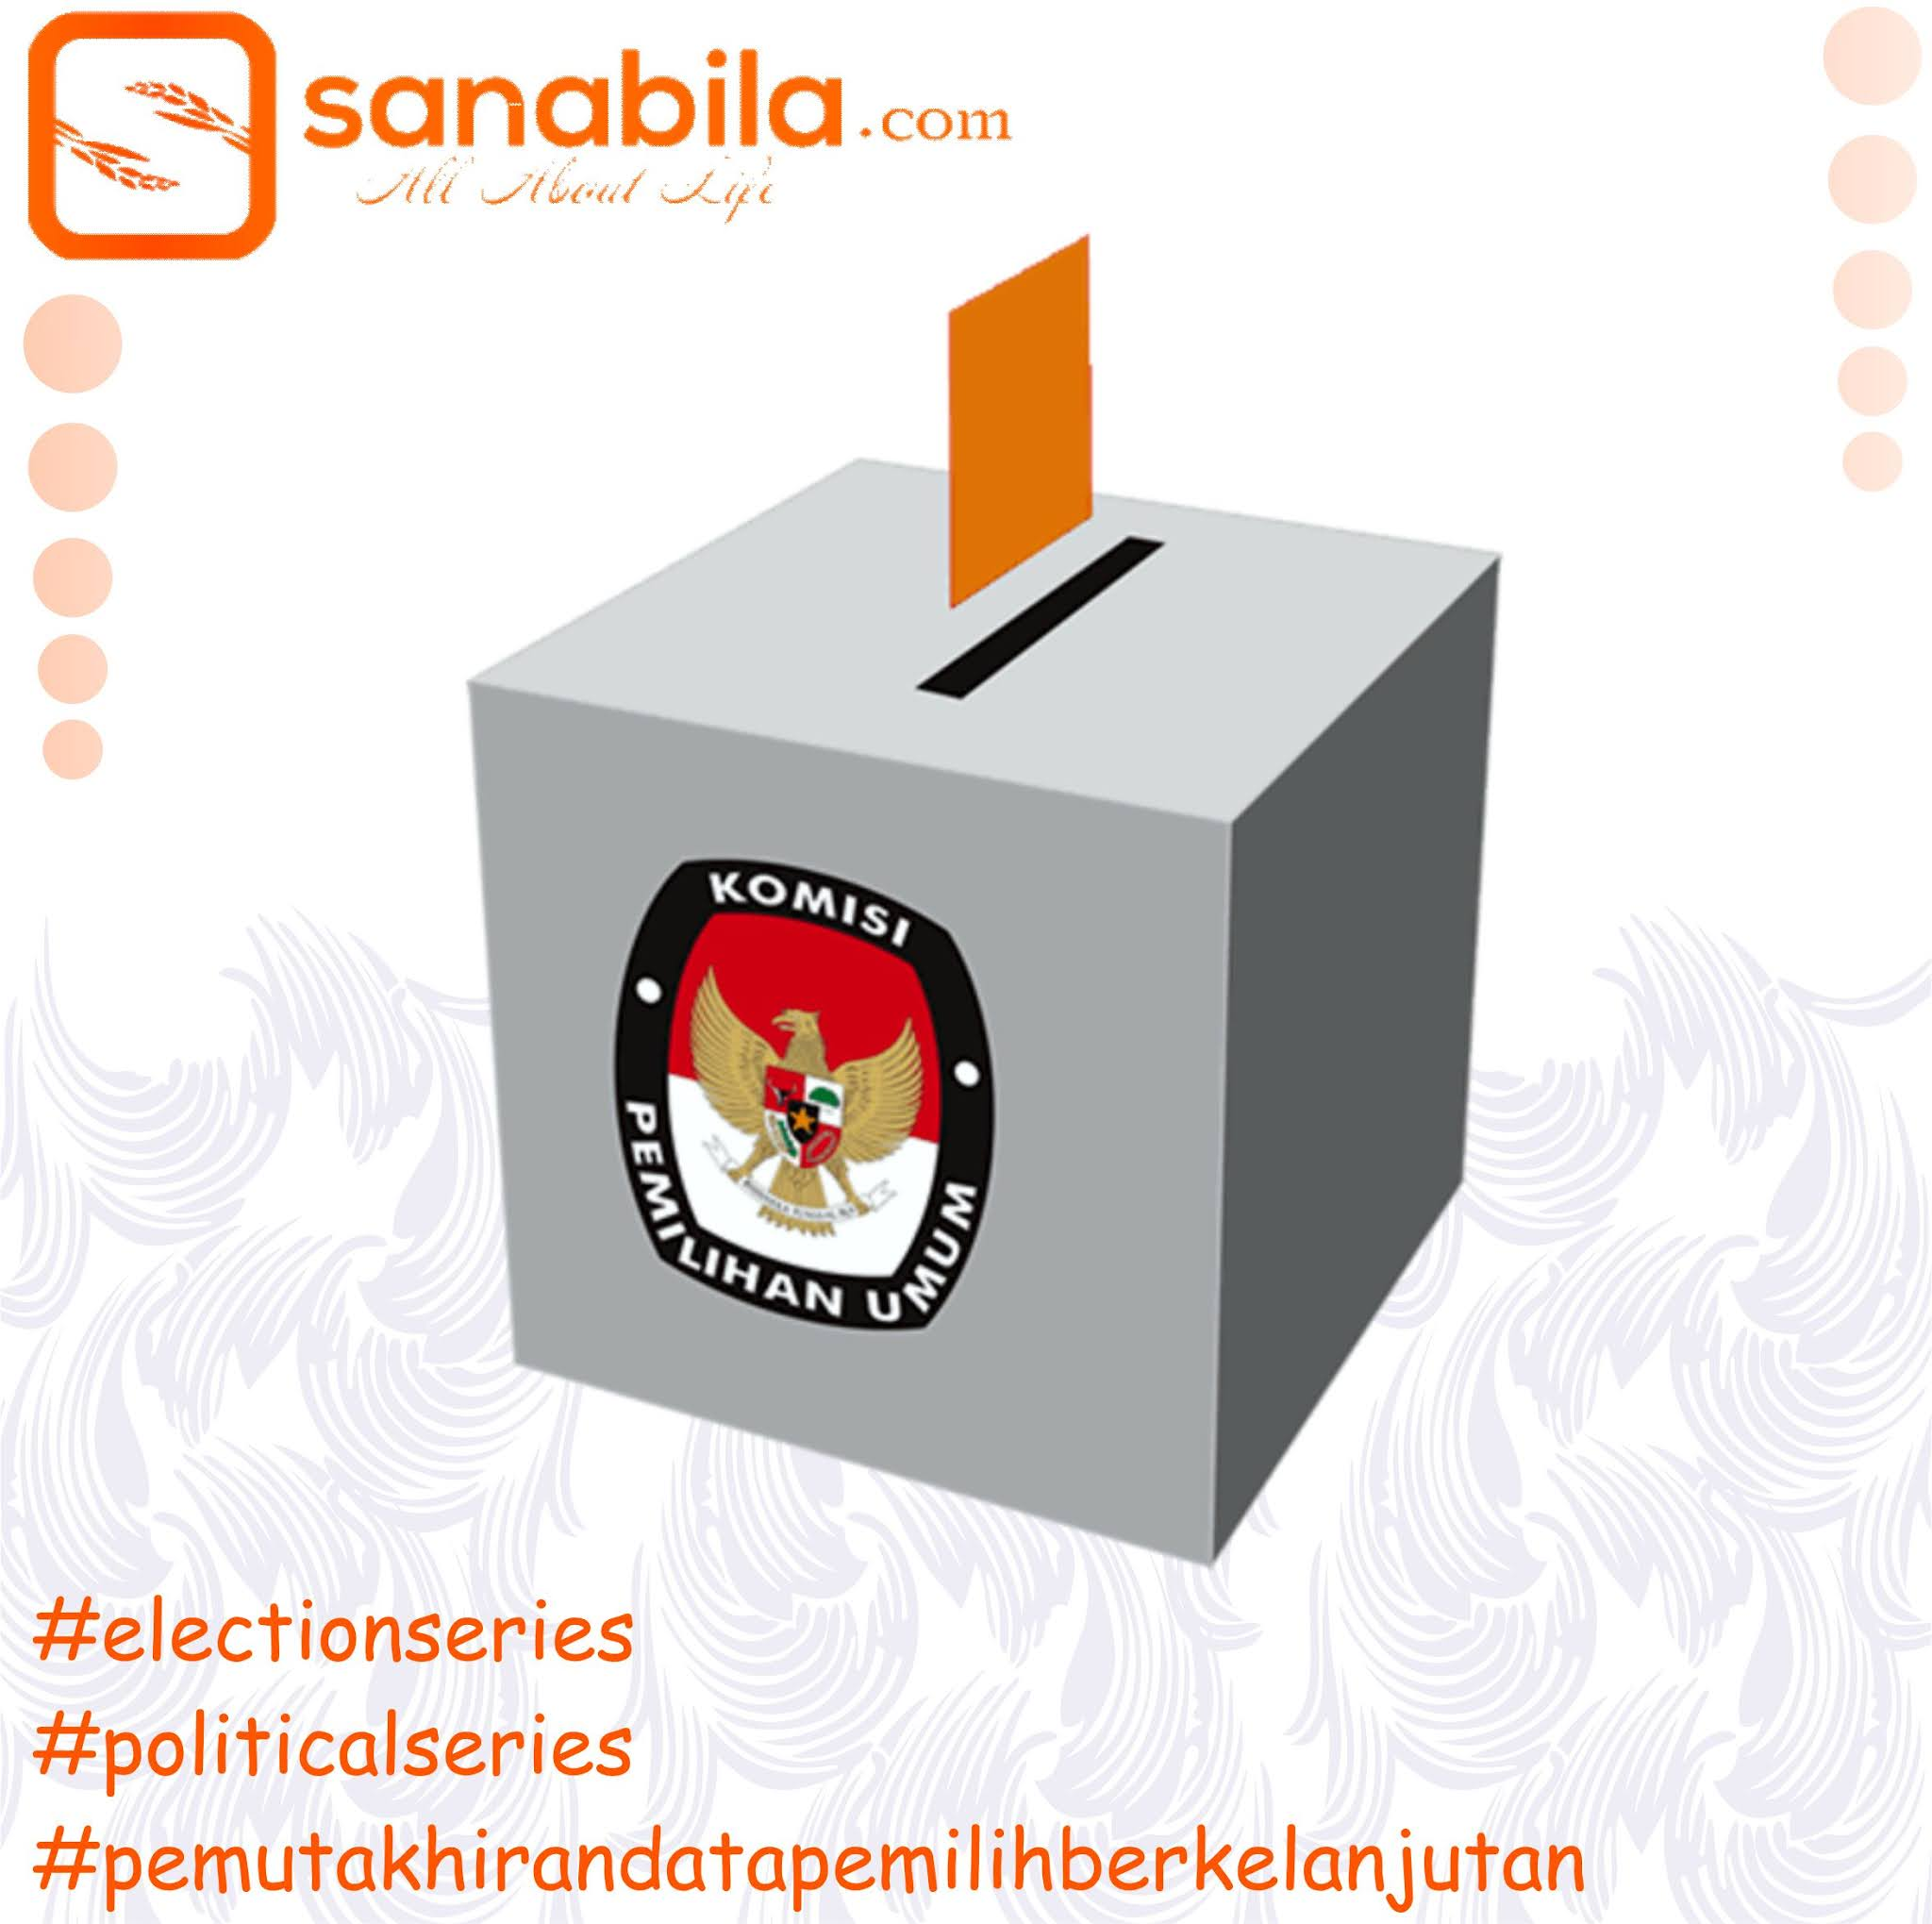 Belajar Pemutakhiran Data Pemilih Berkelanjutan dari KPU Kota Serang